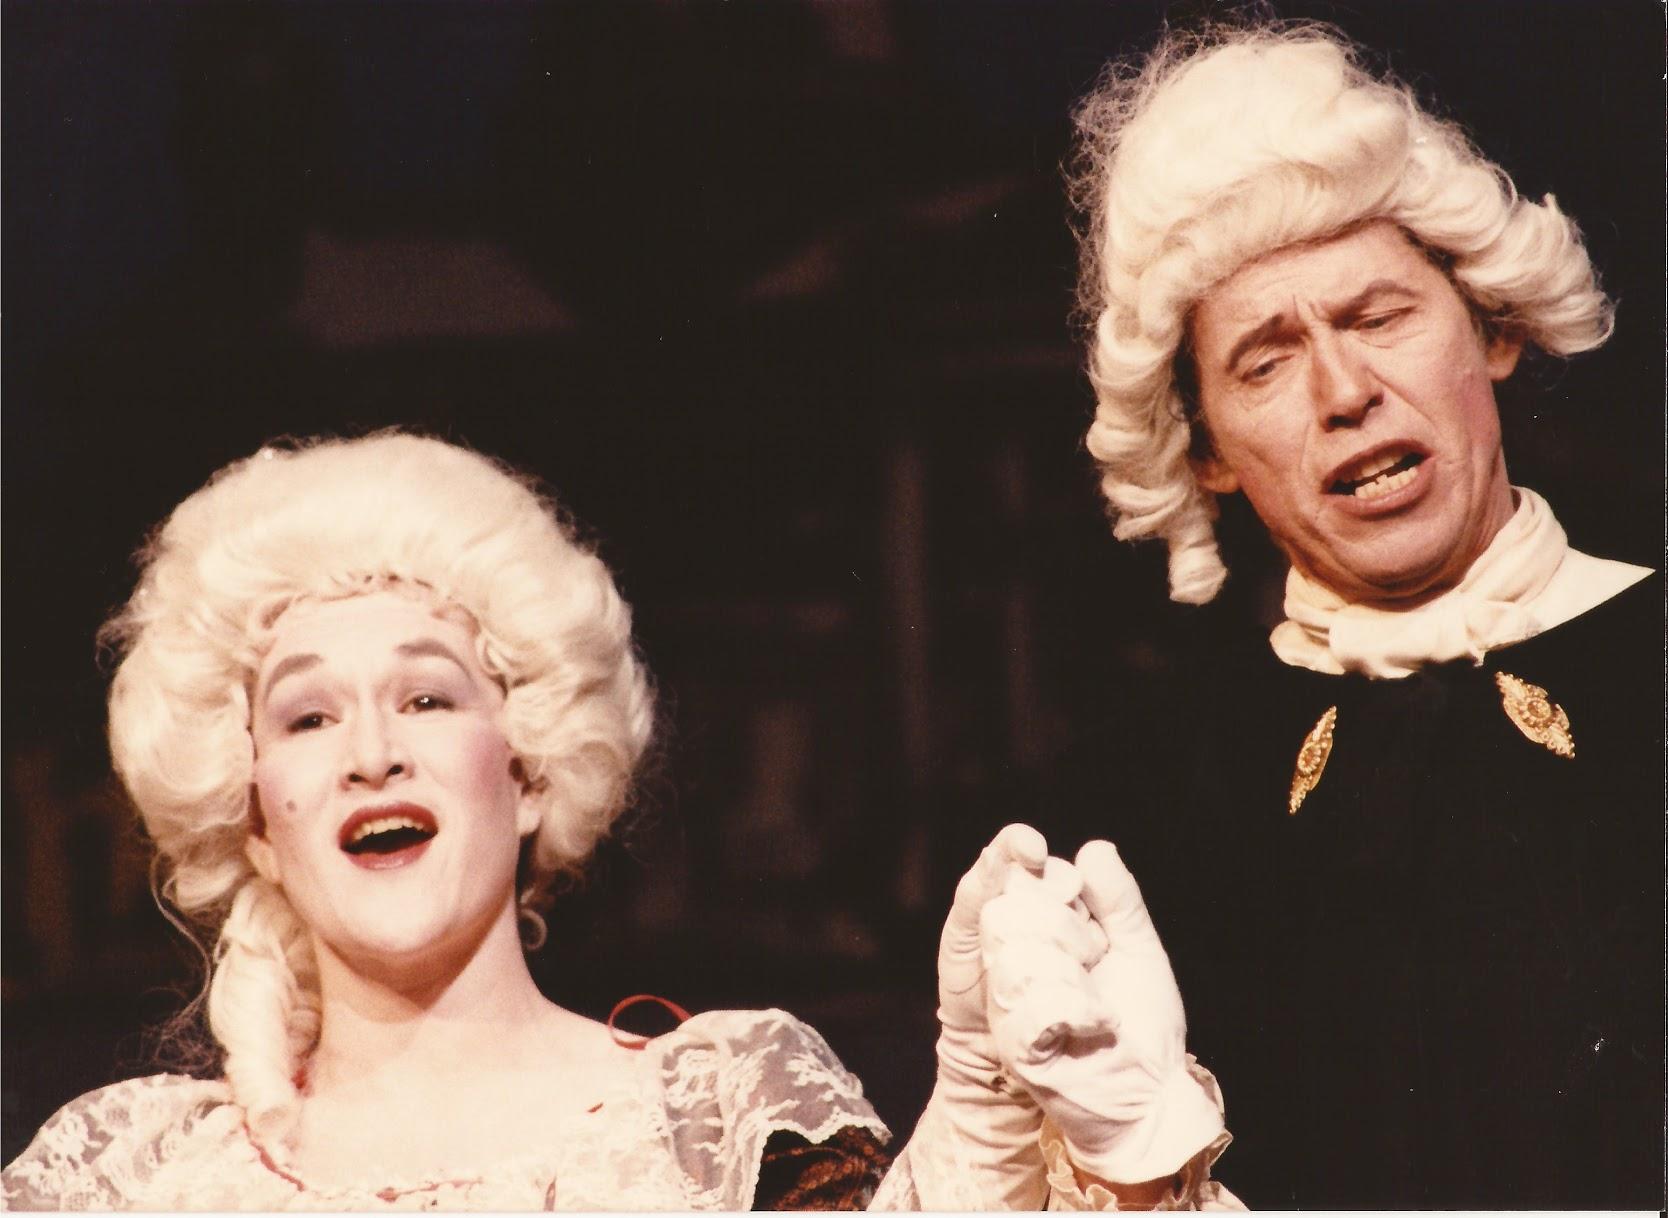 Marline in a Gilber & Sullivan show